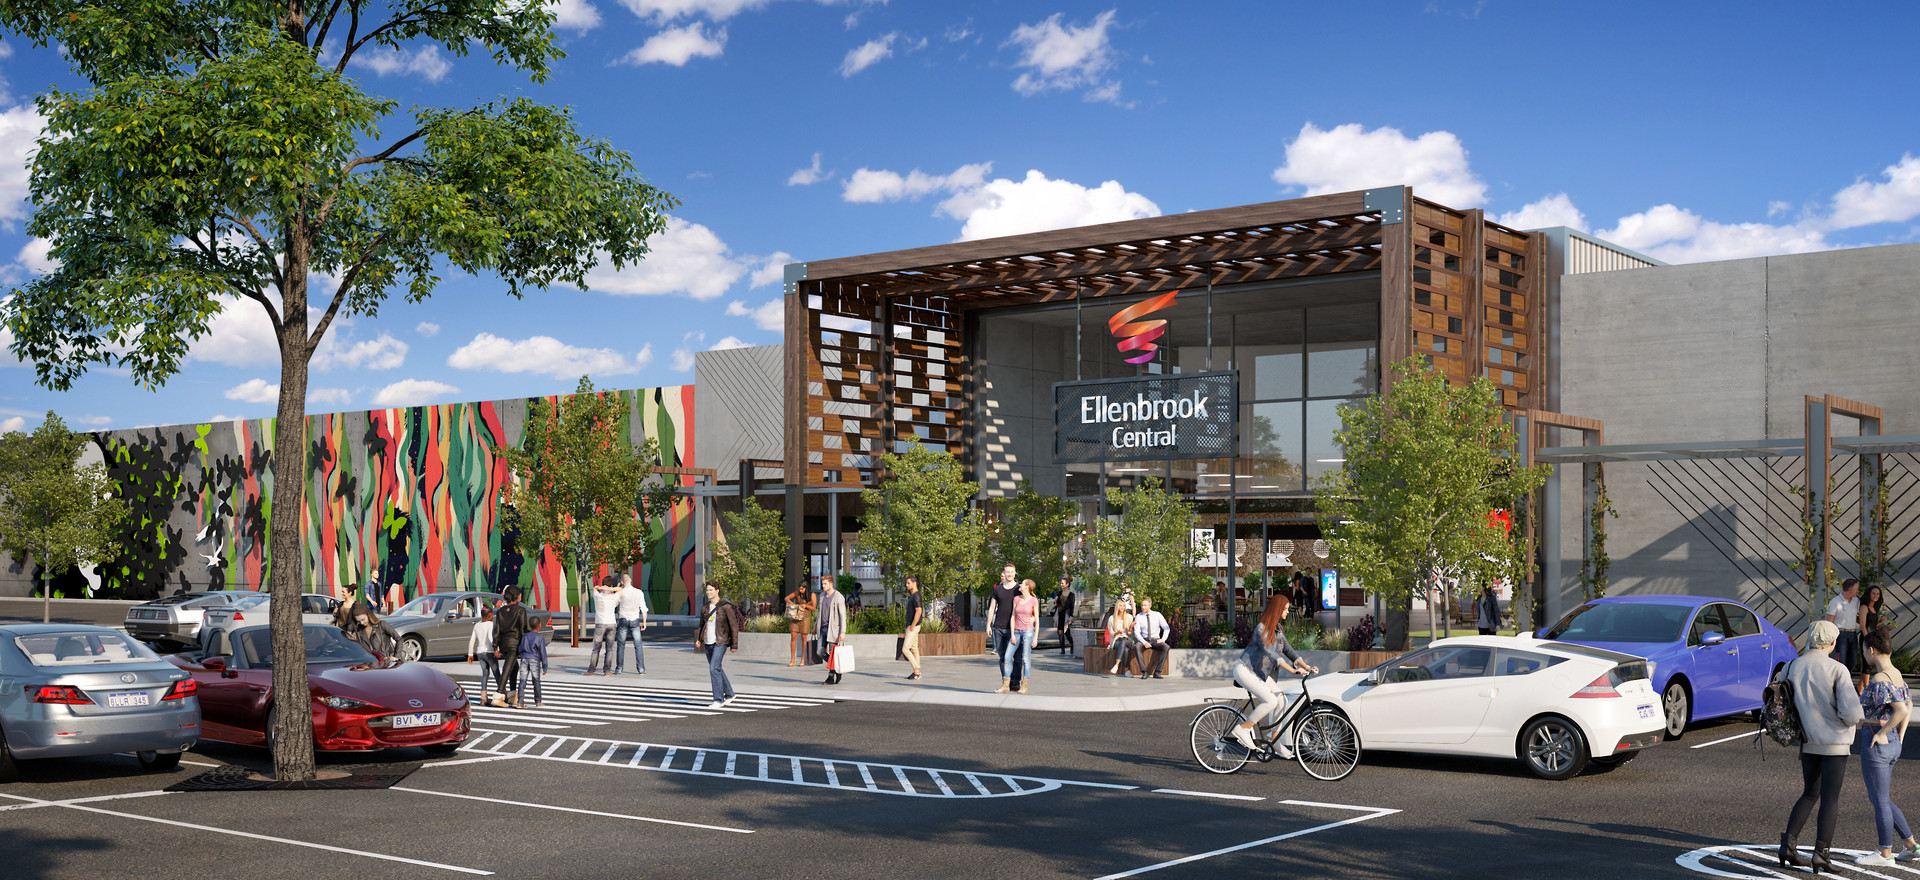 Ellenbrook Central Shopping Centre - Stage 3 Redevelopment